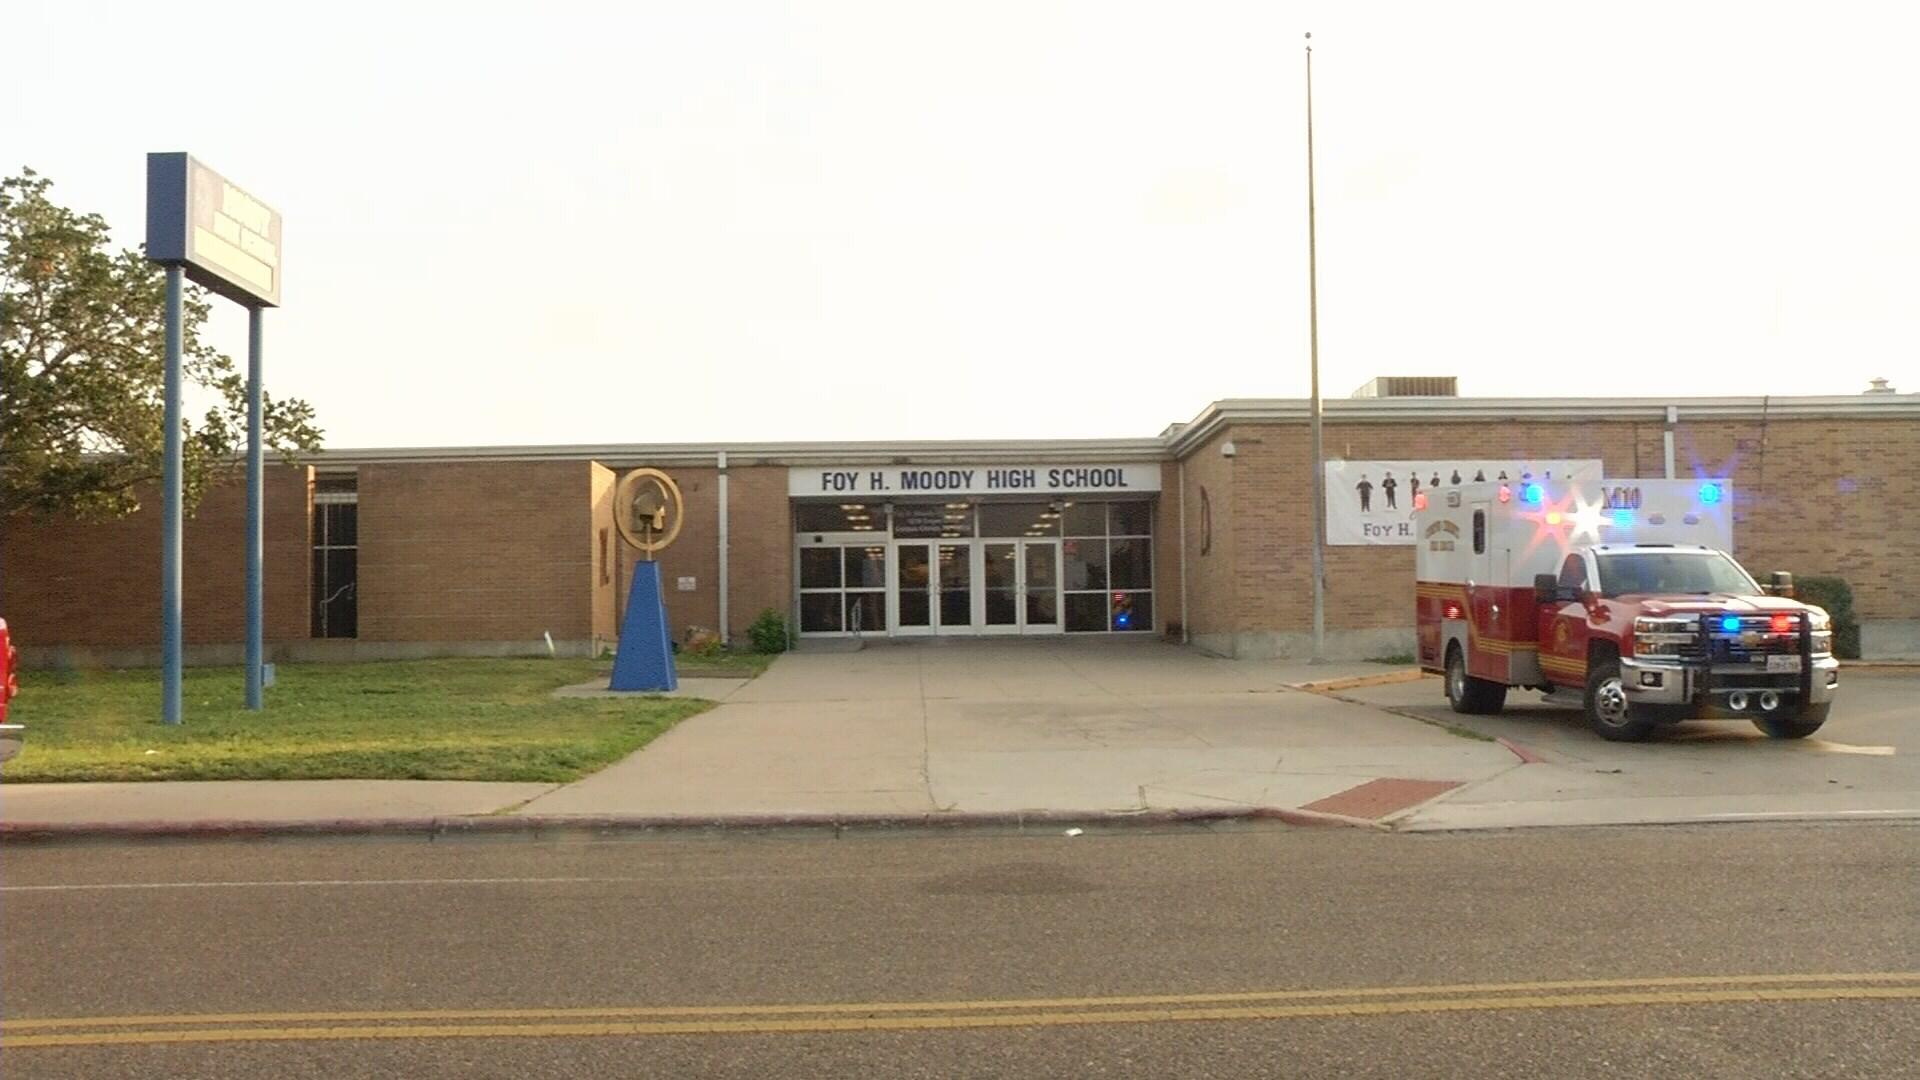 A CCISD Security Officer found a young boy hiding inside a Moody High School restroom Thursday morning.